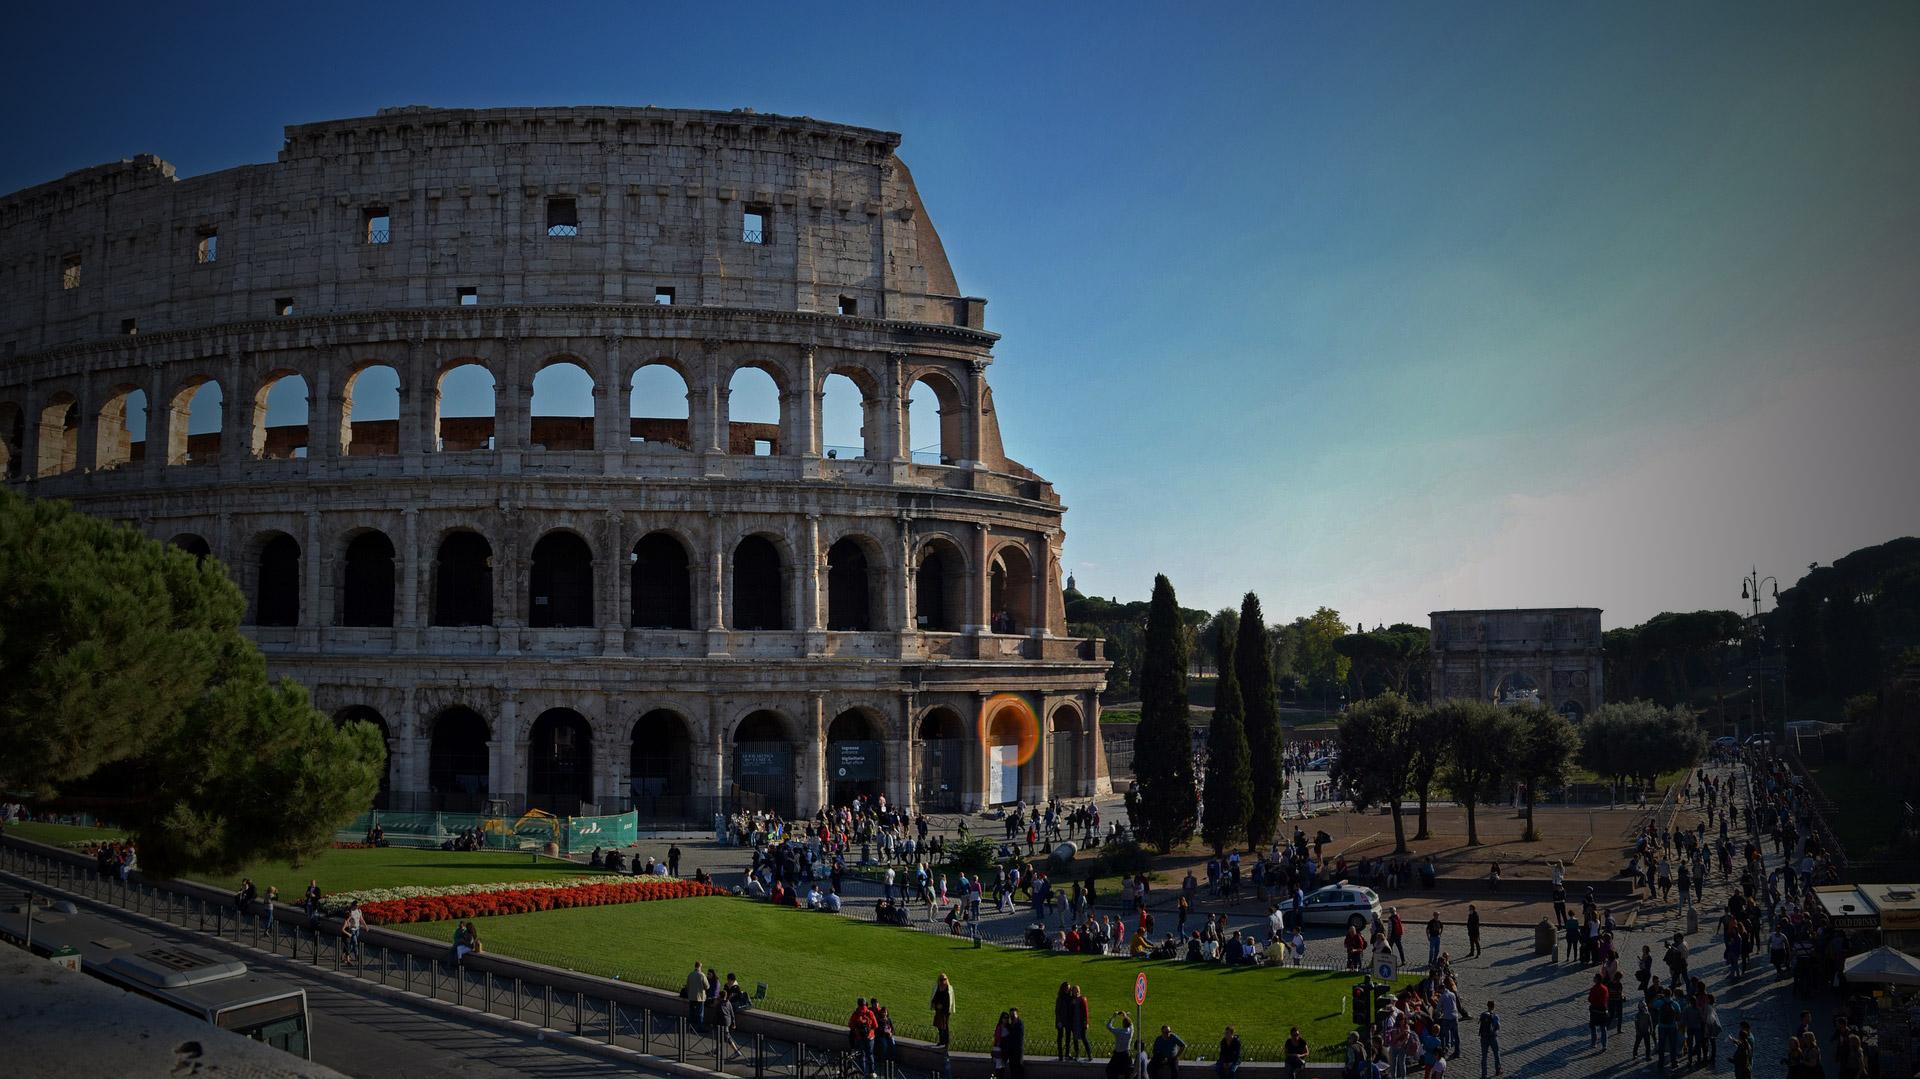 Elena pedretti interprete traduttrice guida turistica - Ugc porta di roma programmazione ...